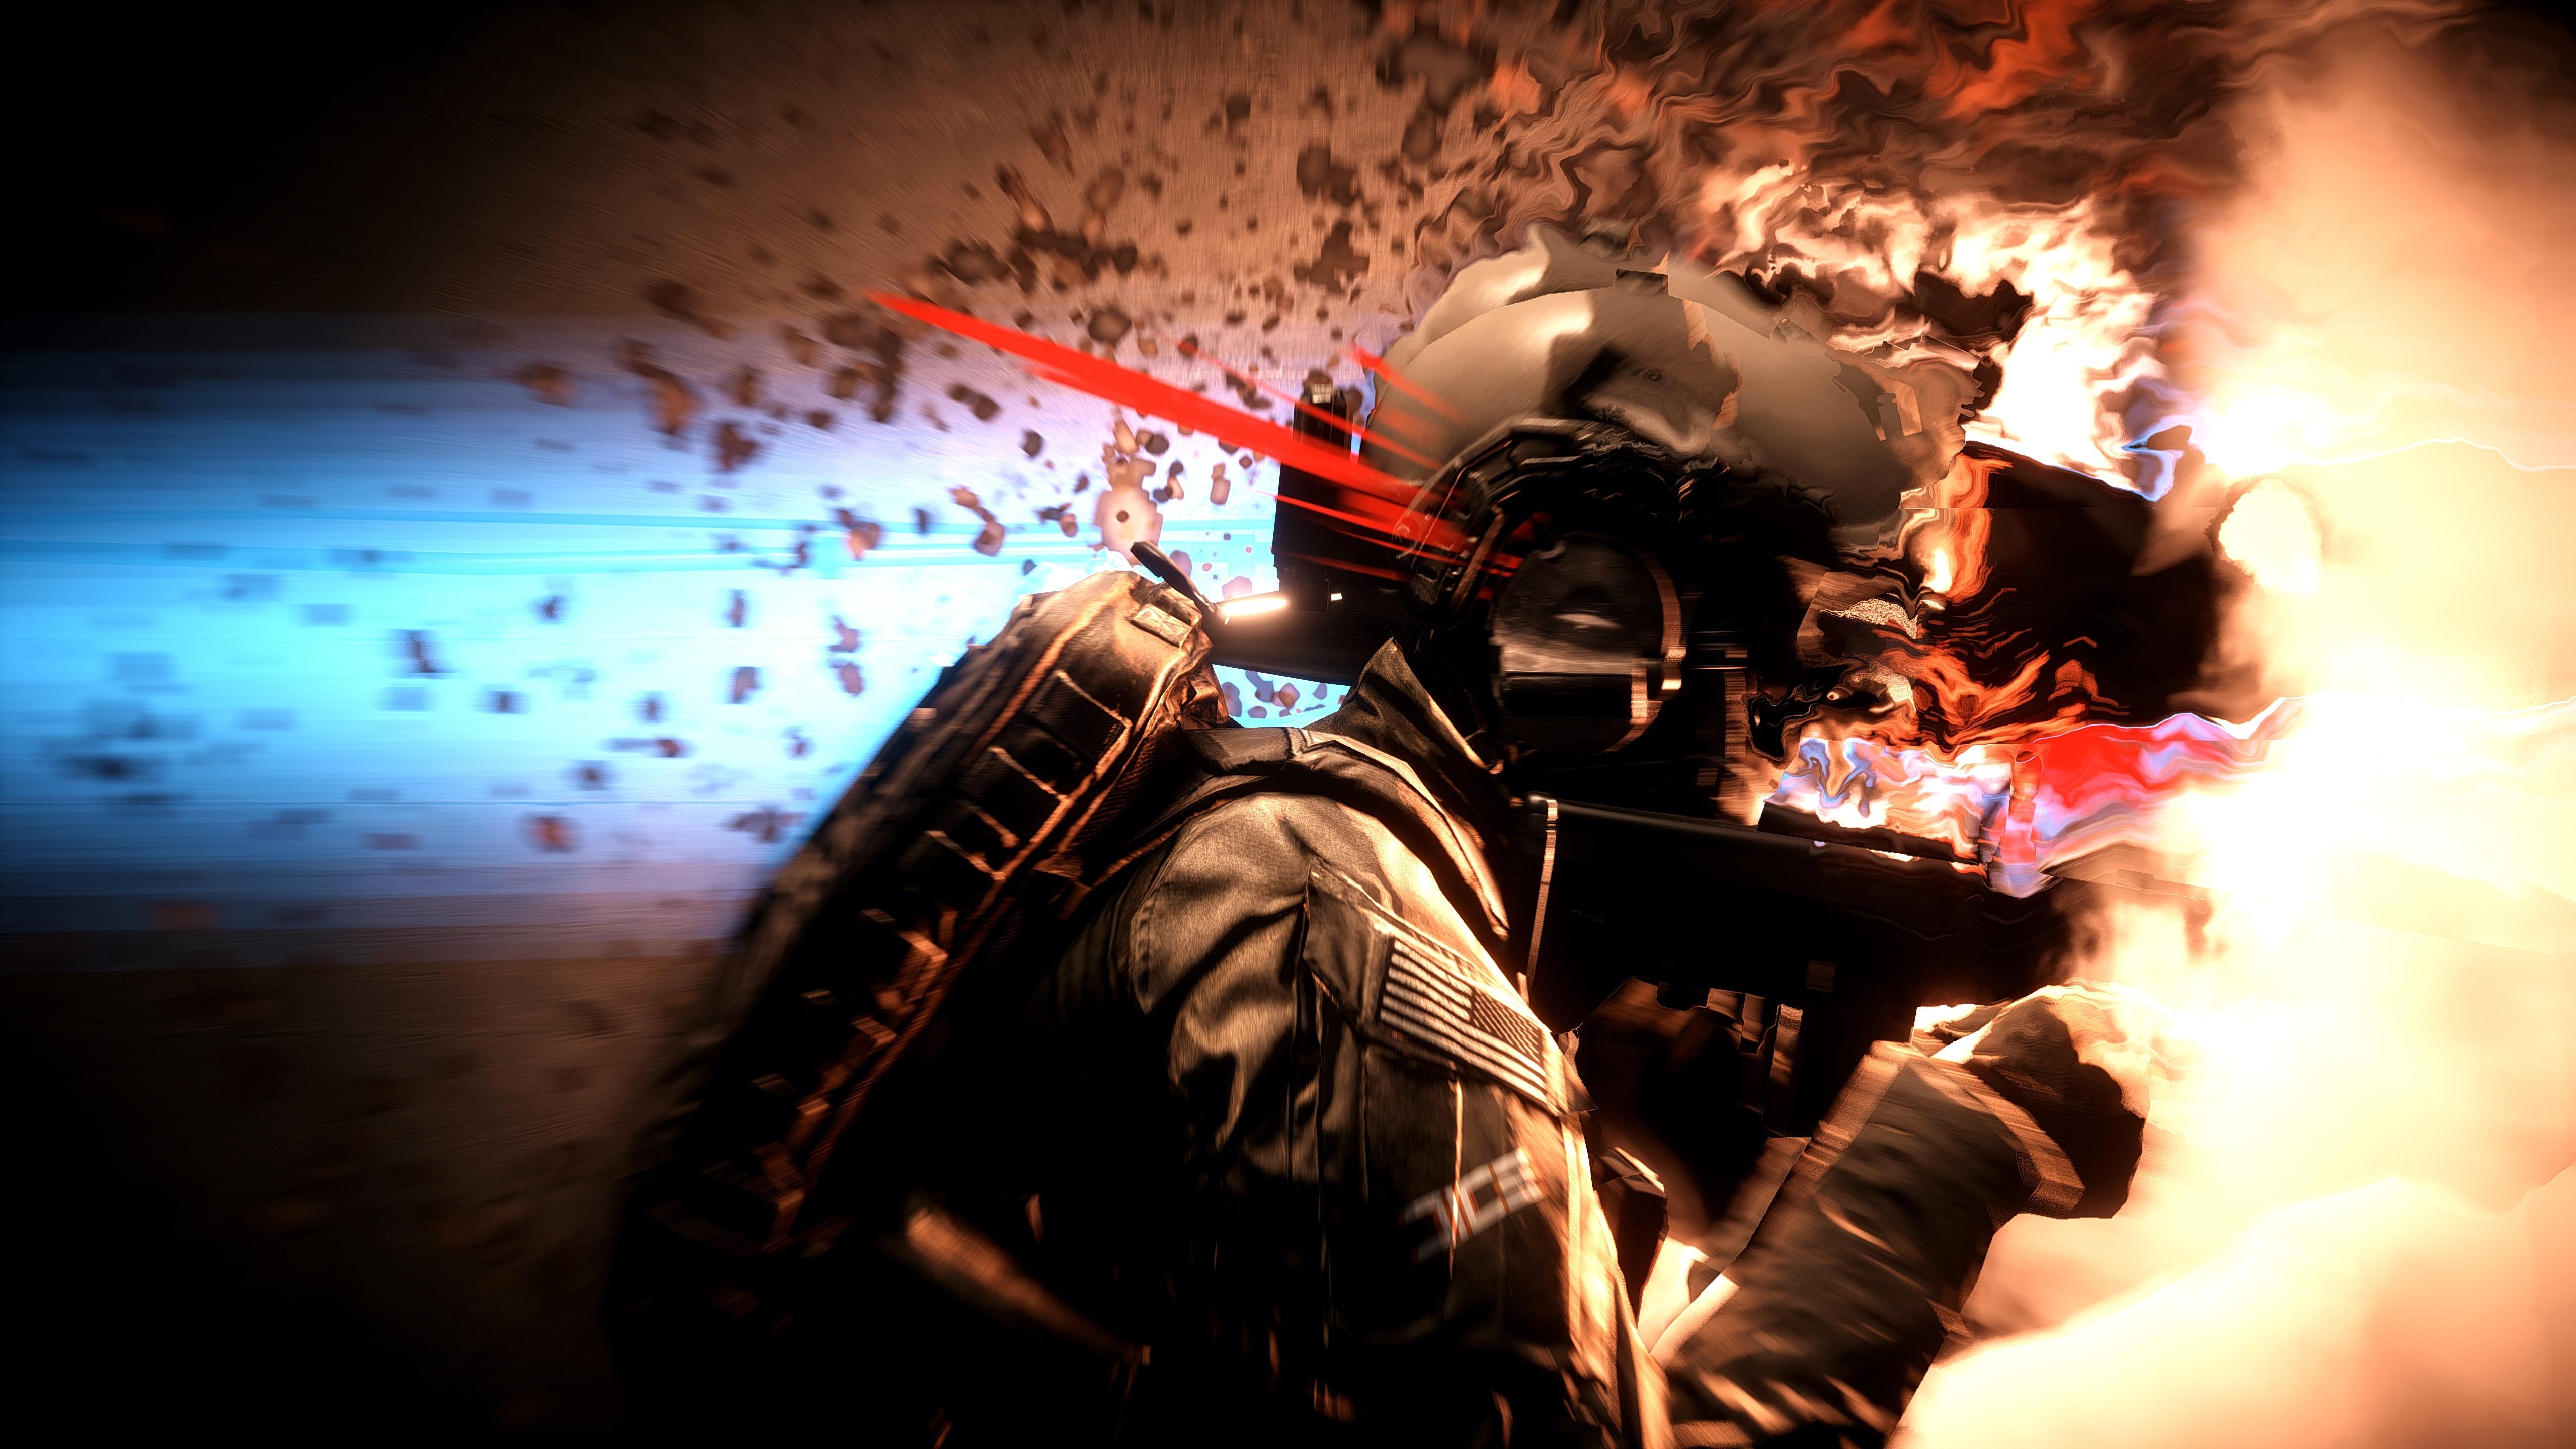 Battlefield 4 Soldier 5k, HD Games, 4k Wallpapers, Images